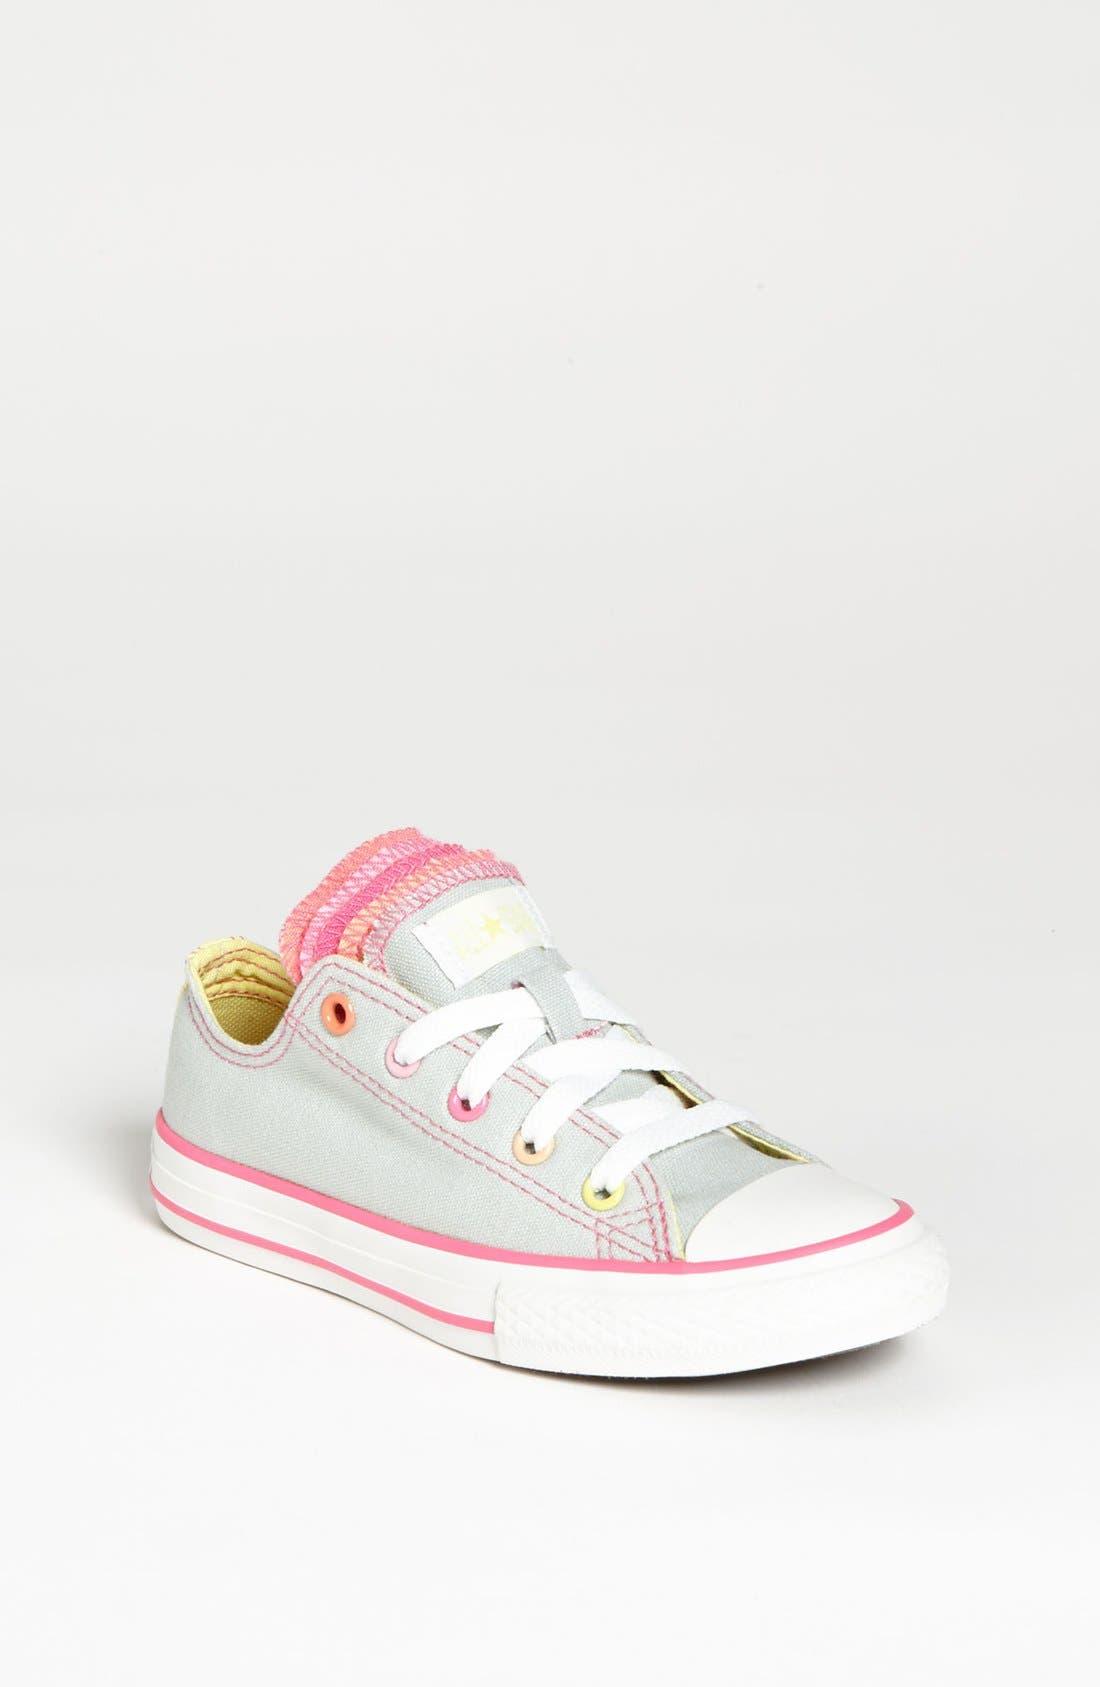 Alternate Image 1 Selected - Converse All Star® Multi-Tongue Sneaker (Toddler, Little Kid & Big Kid)